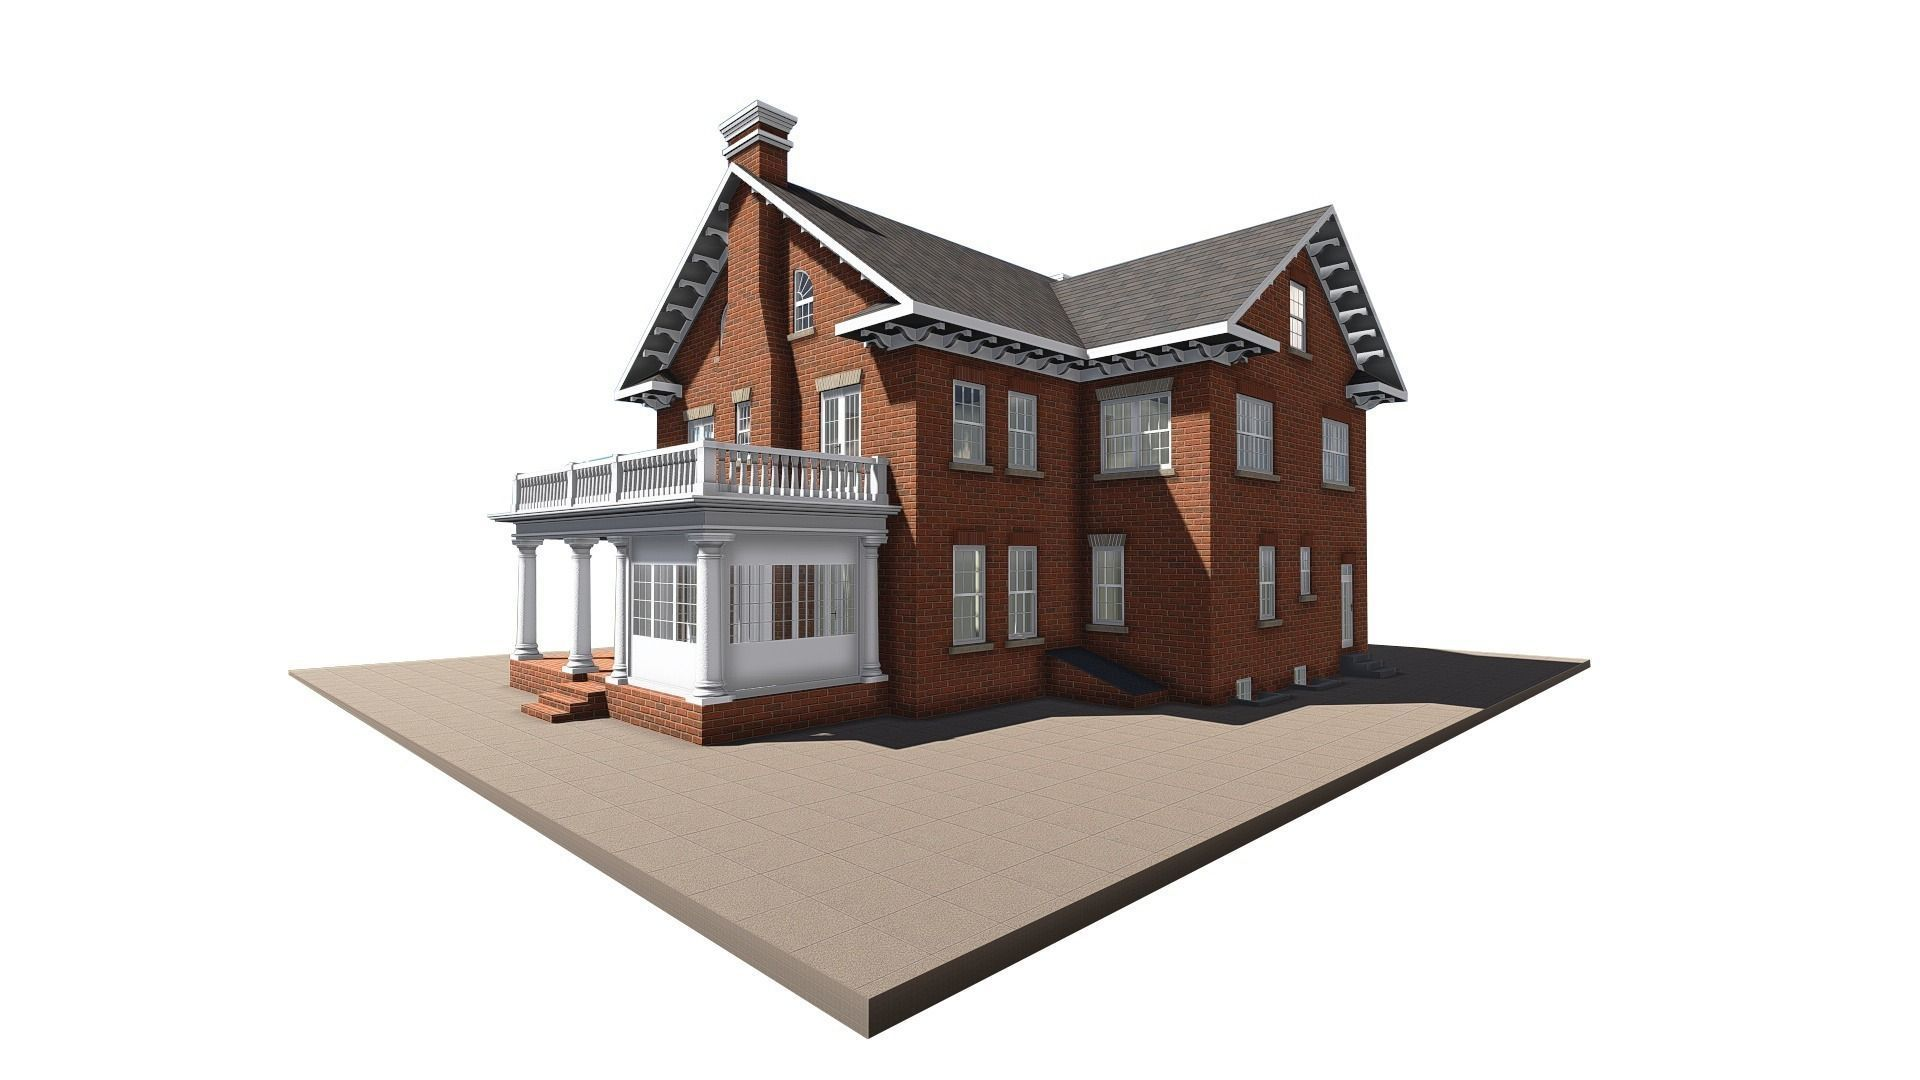 1920x1080 Old Brick House 3d Model Cgtrader